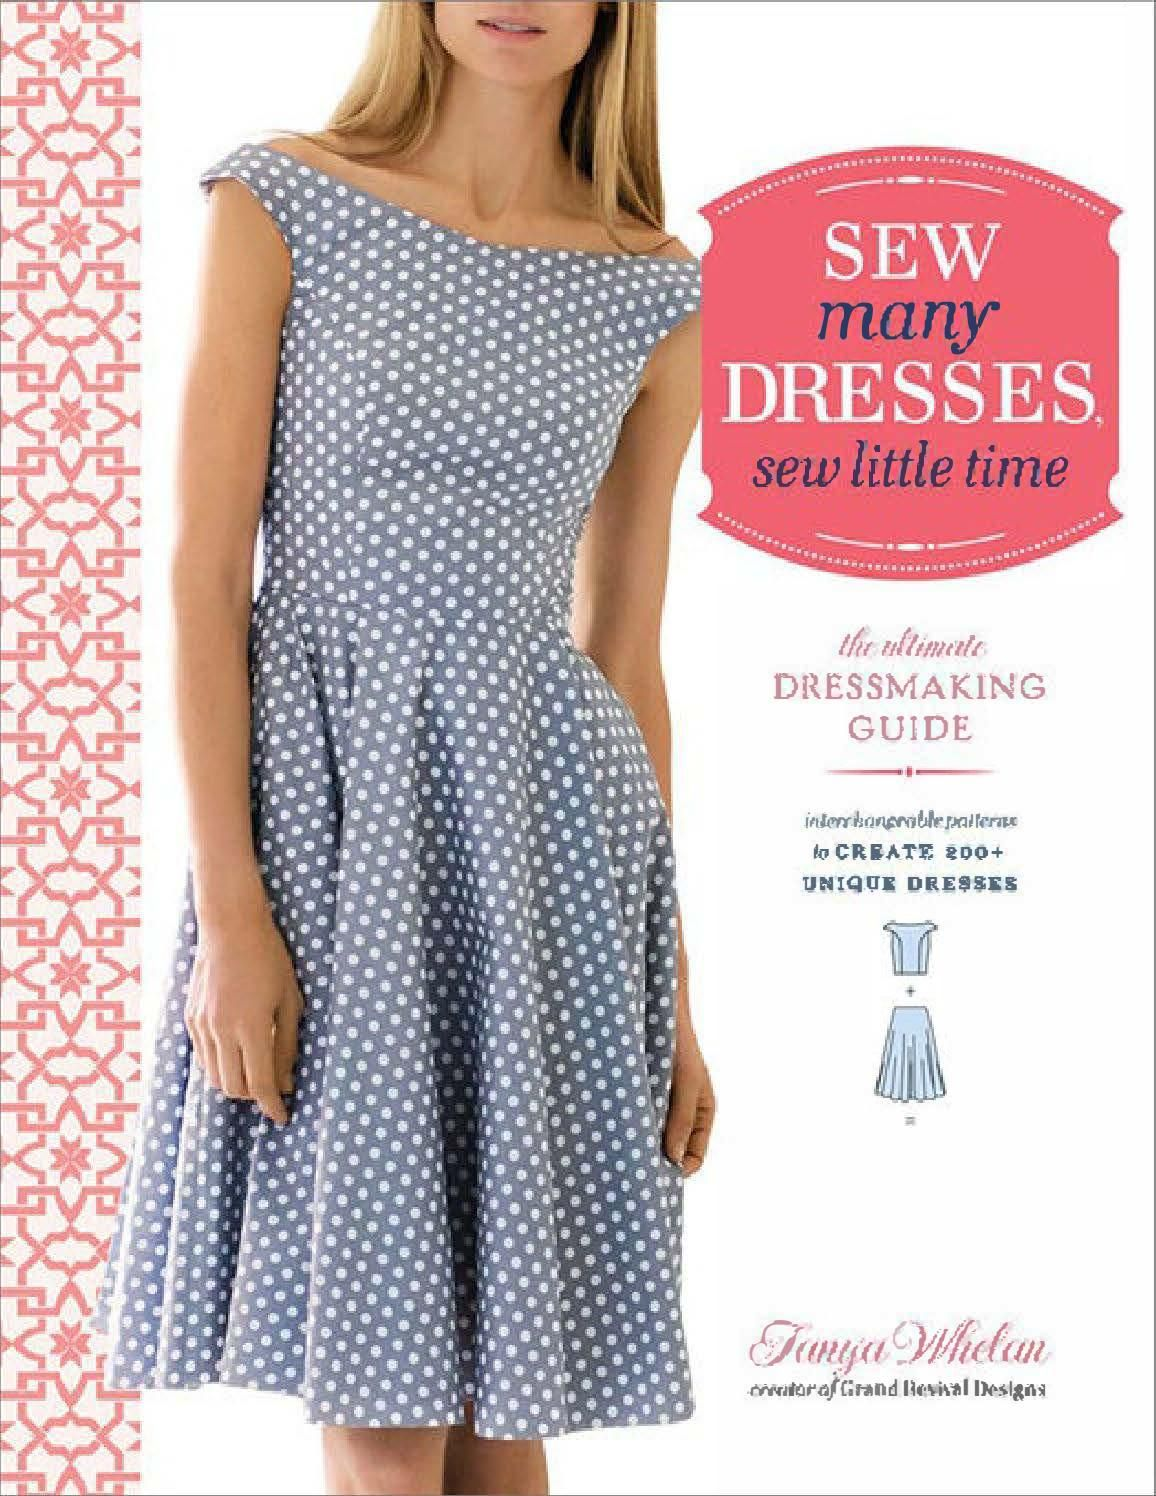 Sew many dressws | Dress sewing, Fashion fabric and Dress patterns